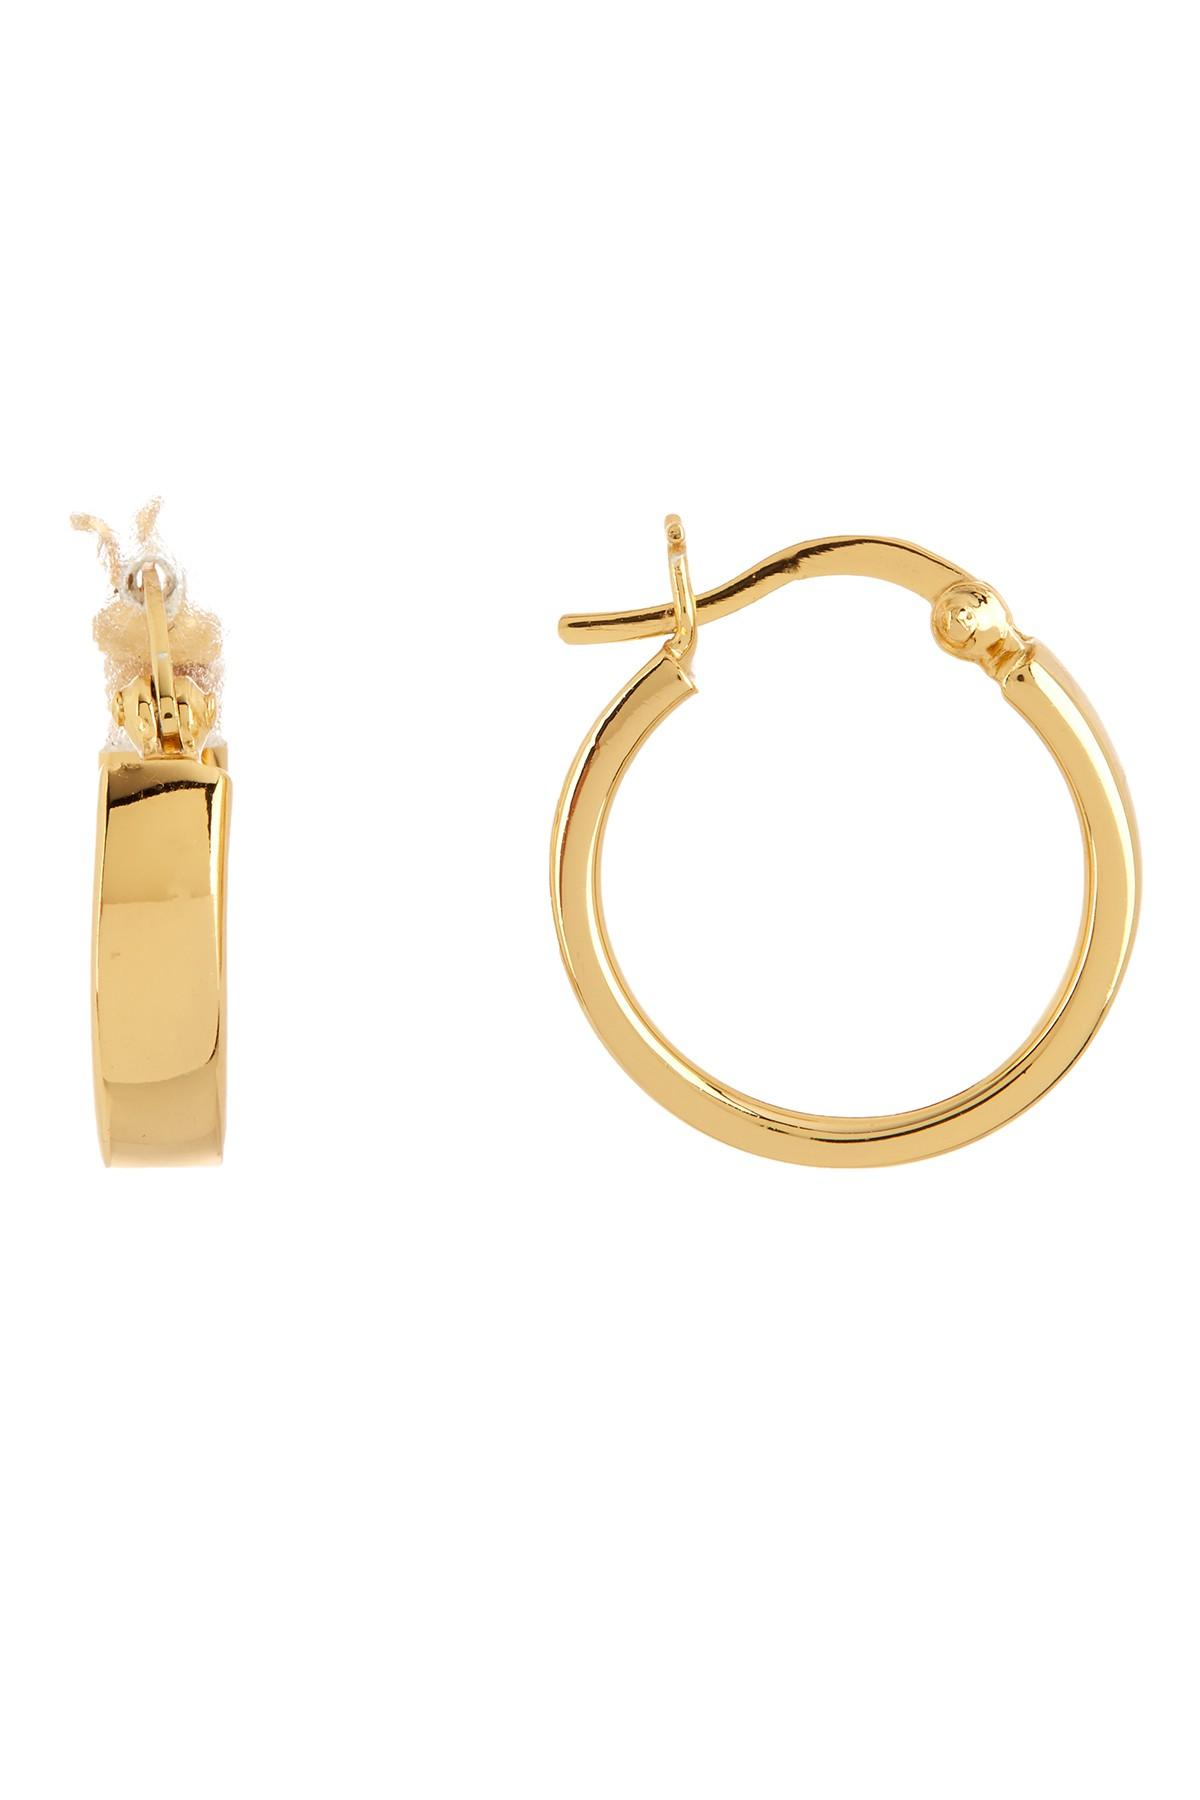 8f1dd93b2 Argento Vivo 18k Gold Plated Sterling Silver Mini Square Edge Hoop ...